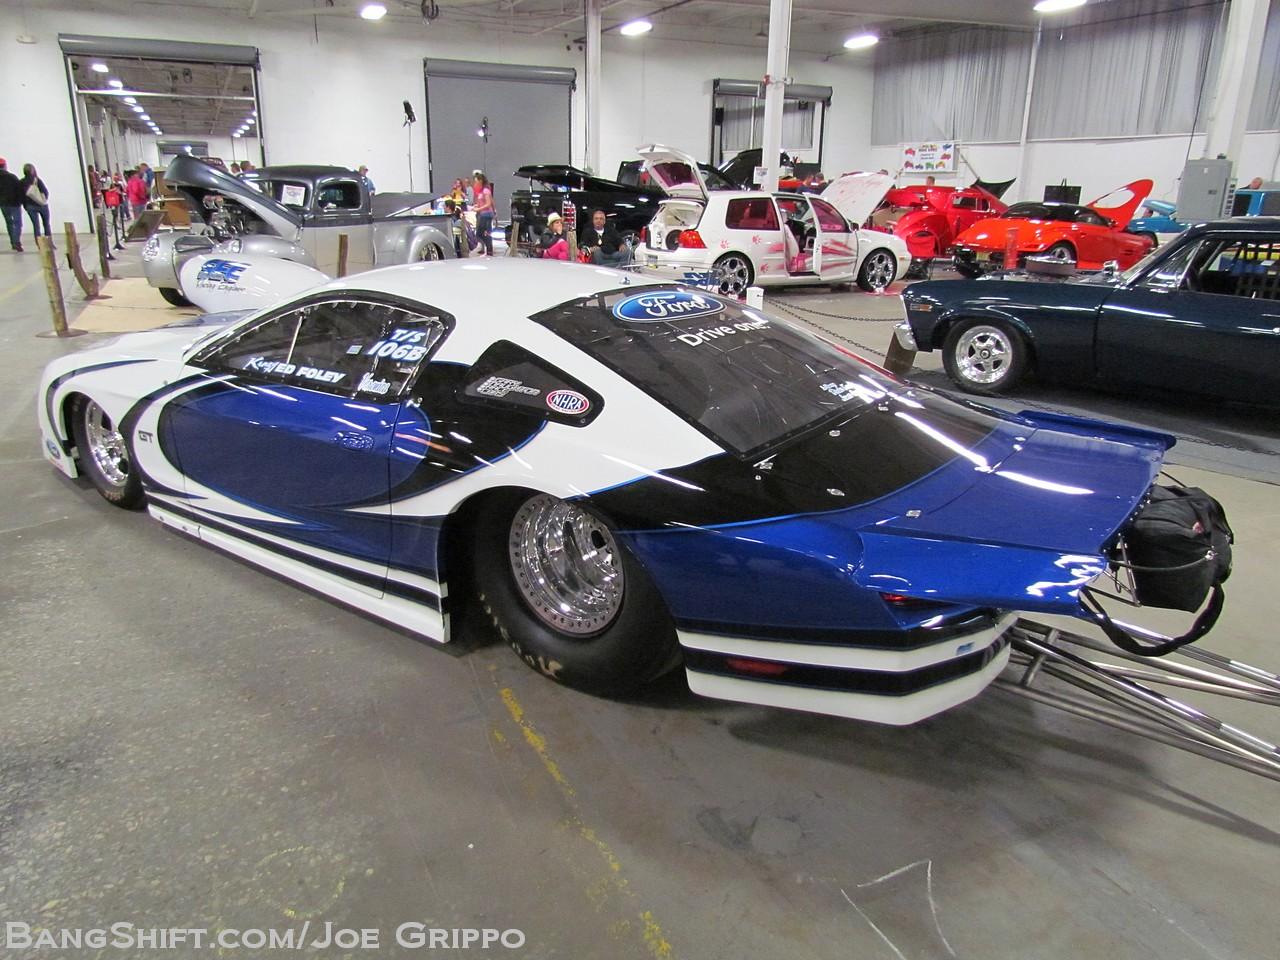 northeast_rod_ad_custom_show_2013_drag_cars_hot_rod_muscle_cars_hemi_camaro_mustang_chevy_ford28